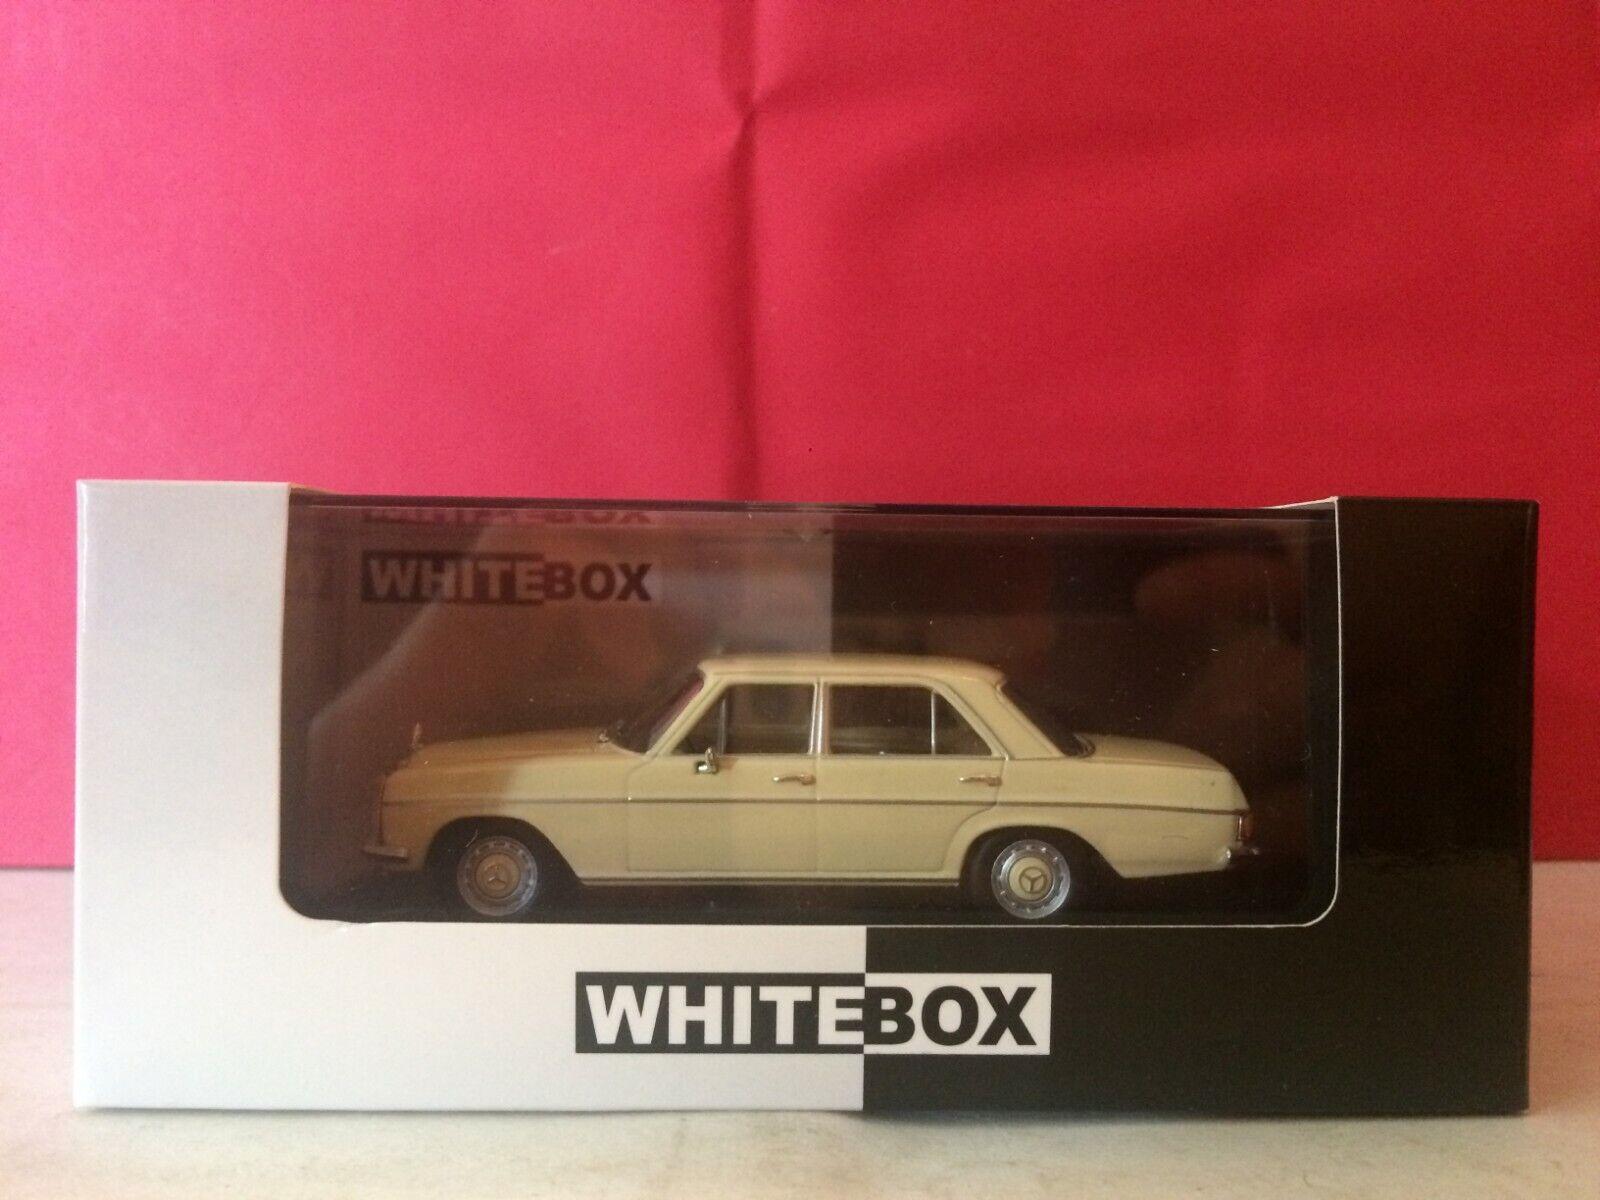 blancoBOX SUPERBE MERCEDES BENZ BENZ BENZ 220 SE 1958 1 43 NEUF BOITE AB6 98e833